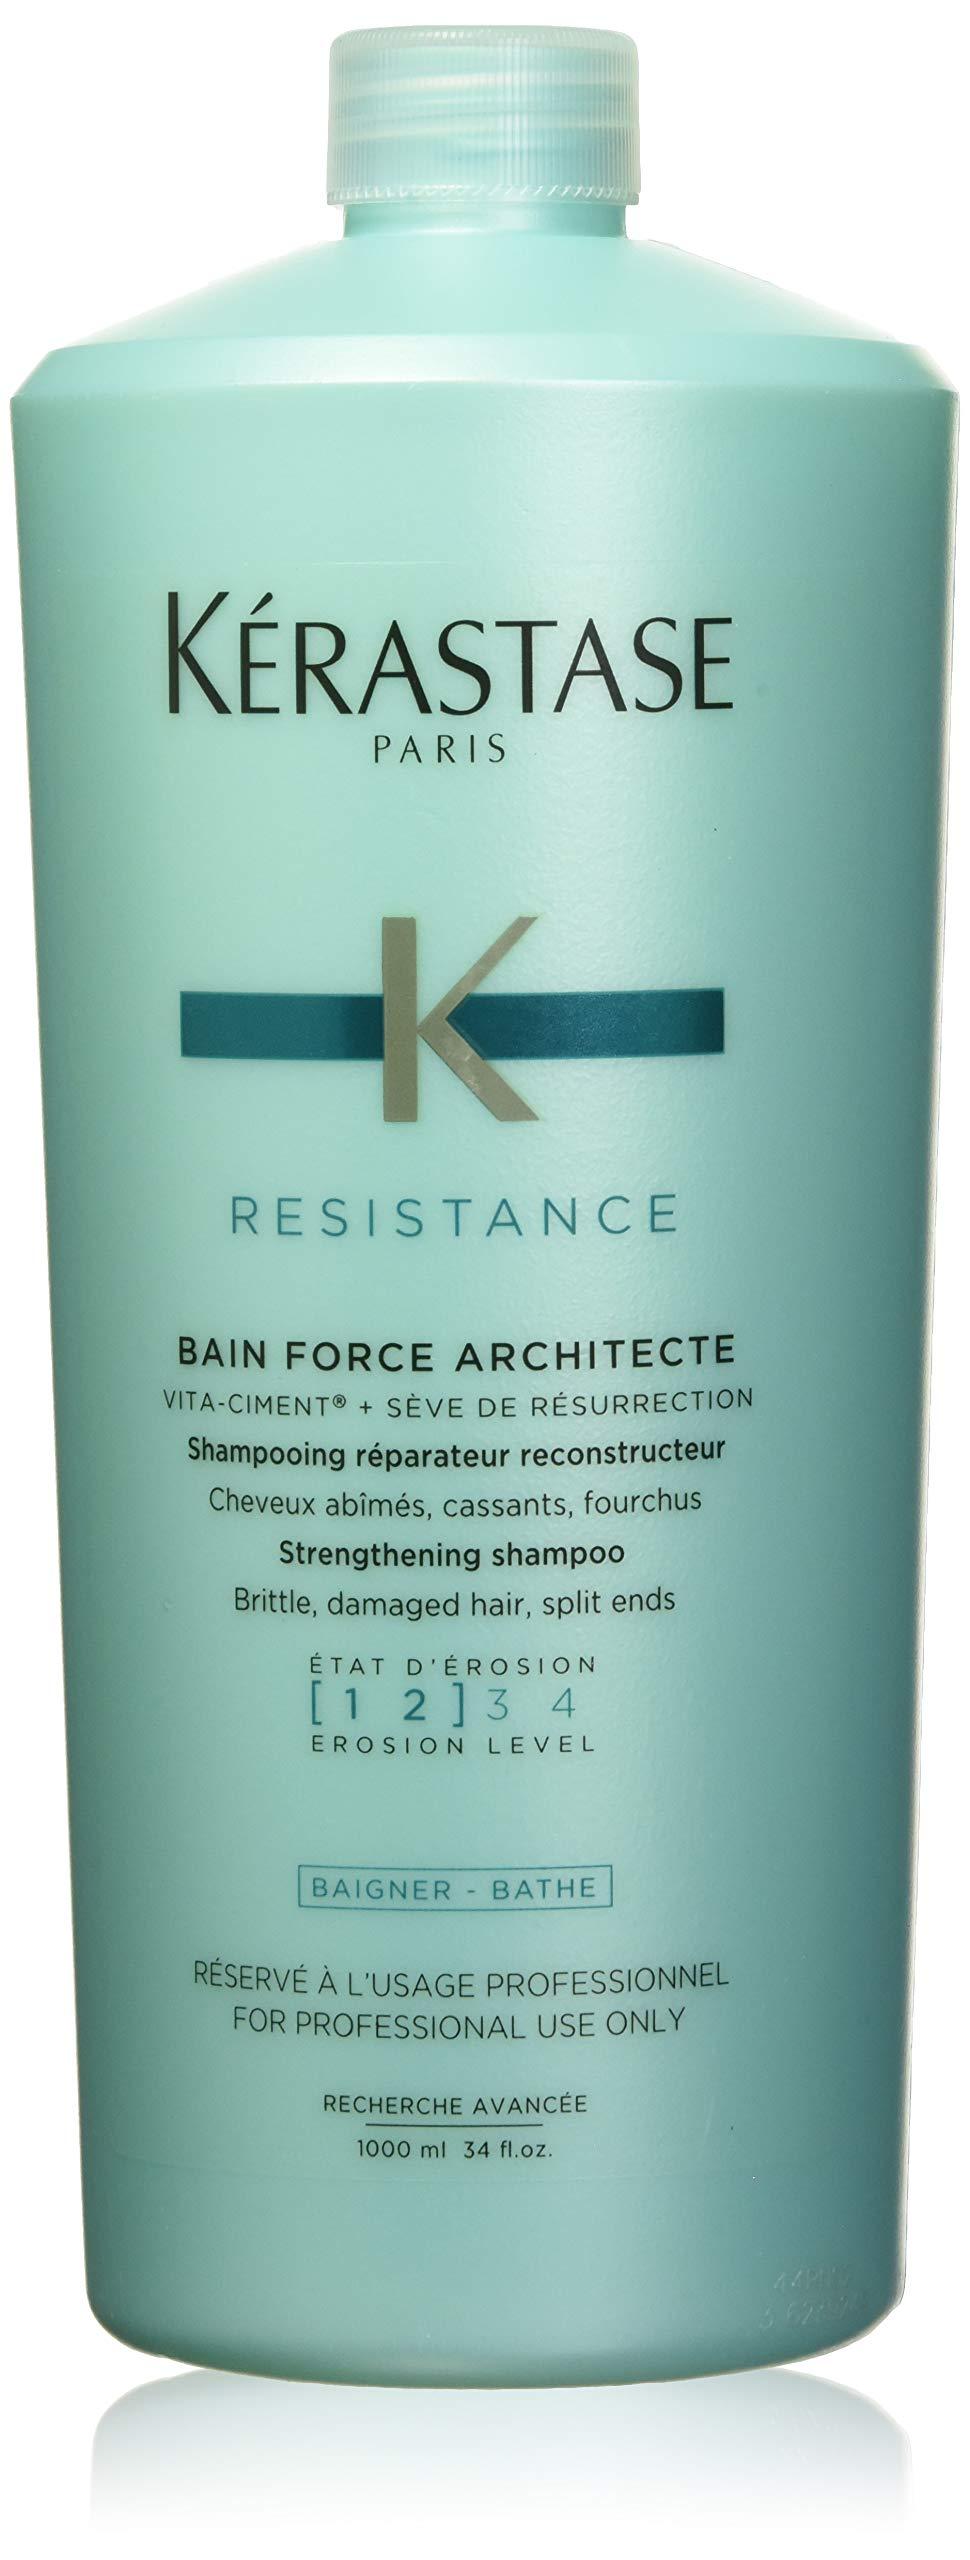 KERASTASE Resistance Bain Force Architecte Shampoo, 34 Fluid Ounce, Multicolor, reg (ABC148)